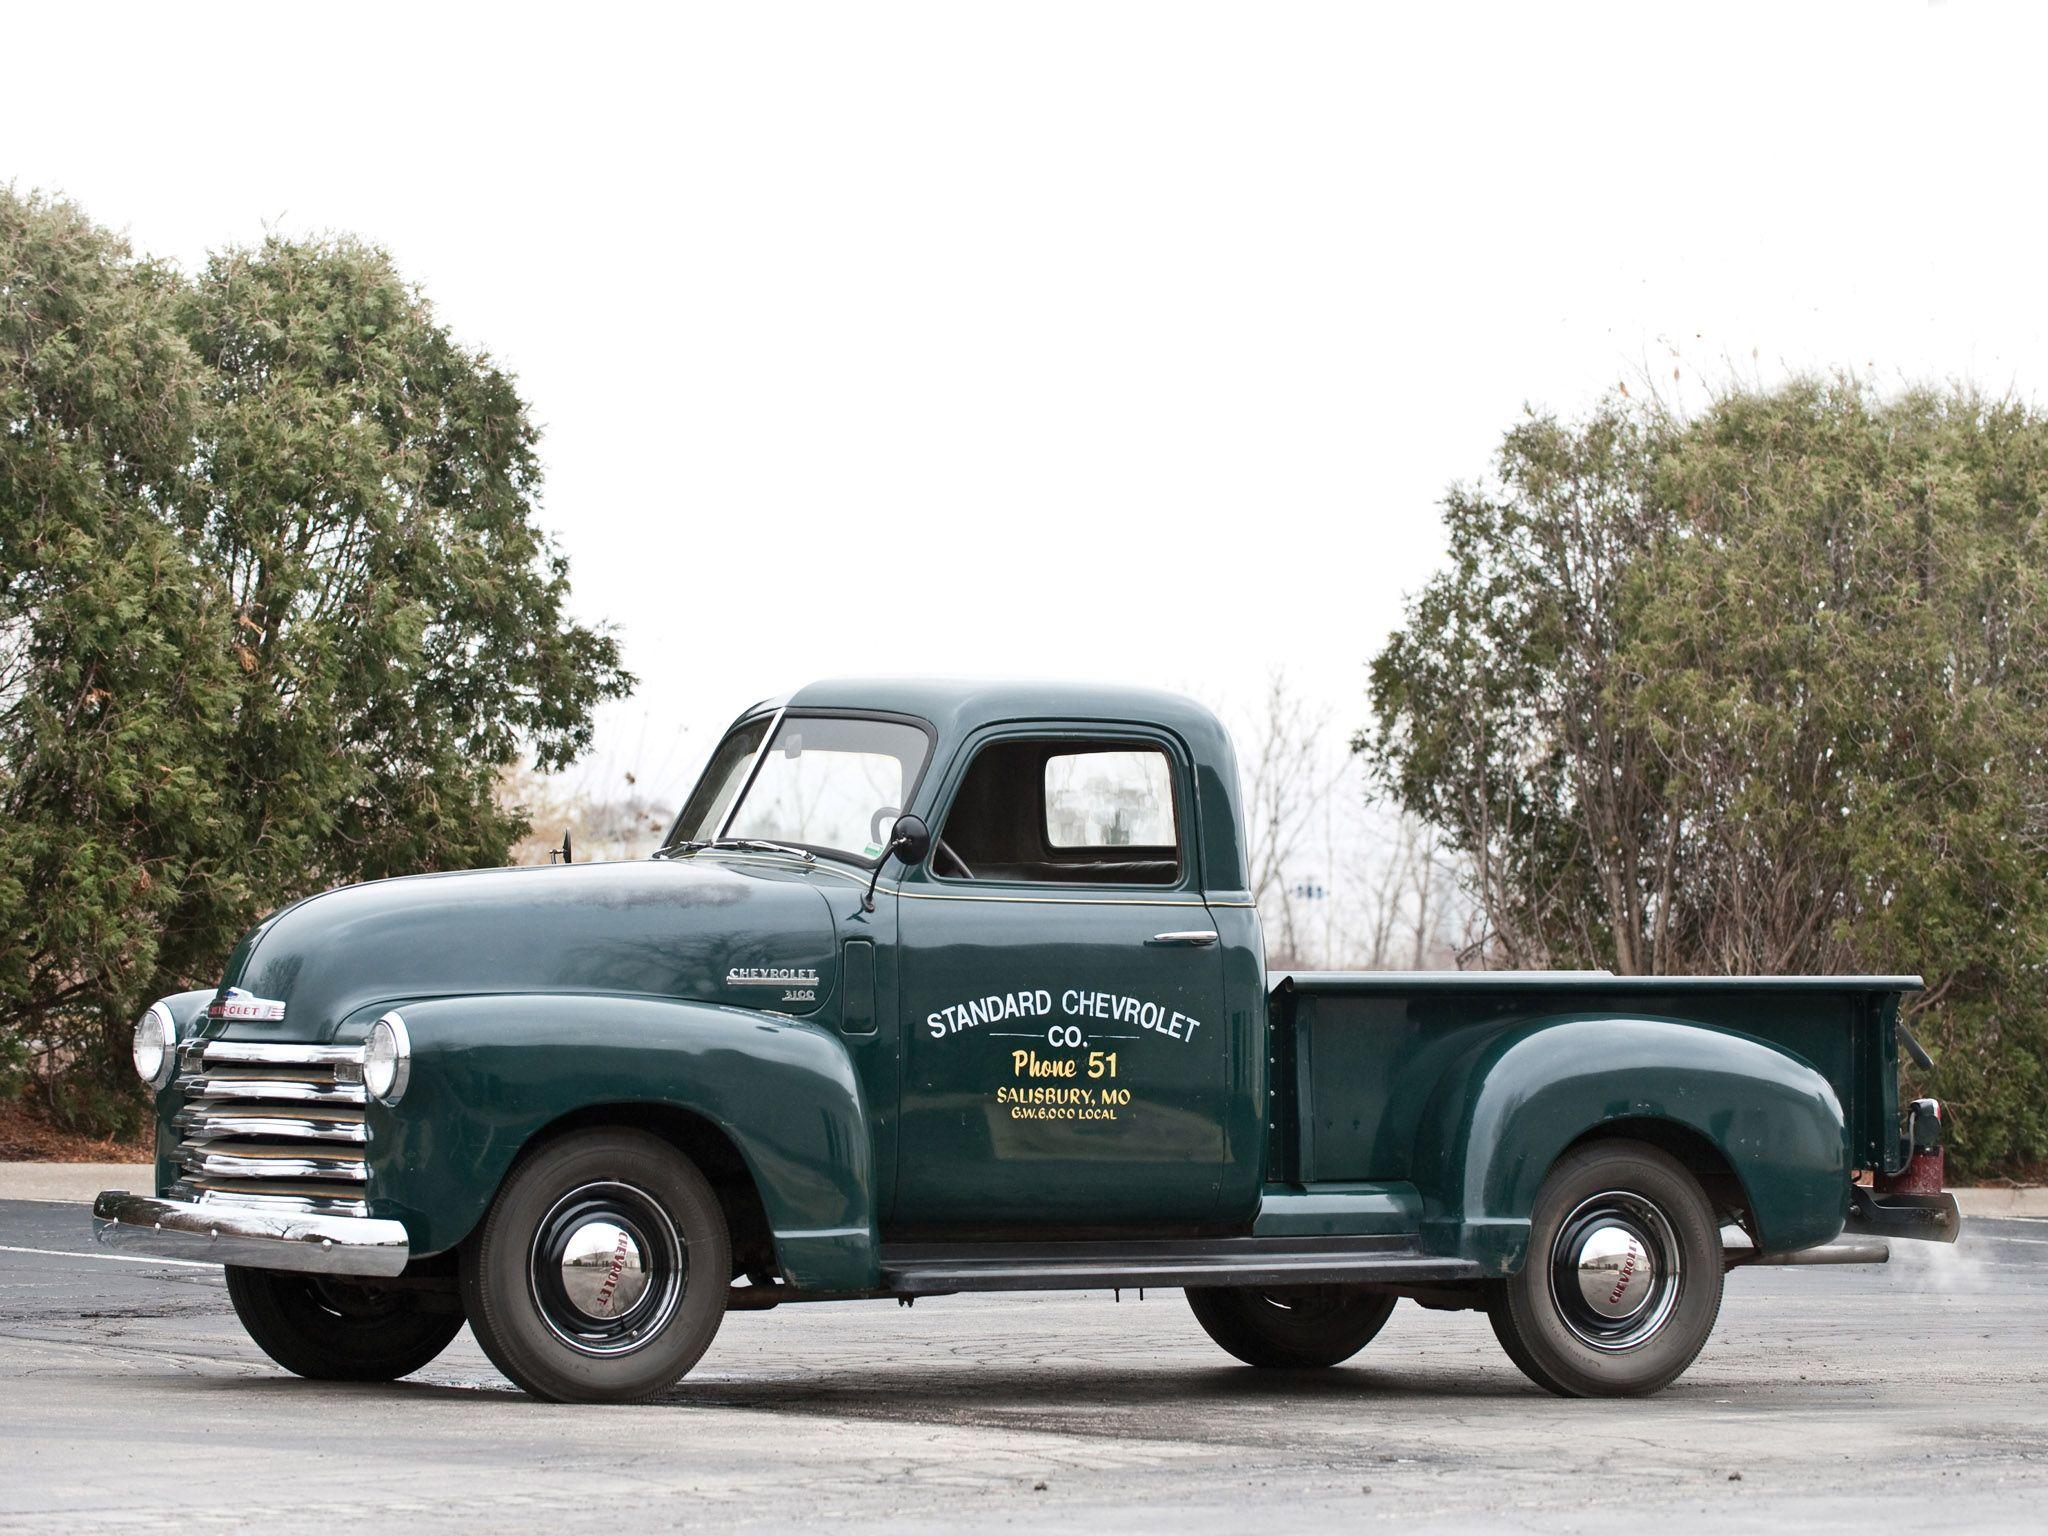 1950 Chevrolet 3100 Pickup Hp 3104 Truck Retro G Wallpaper 2048x1536 104934 Wallpaperup Trucks Classic Cars Trucks Old Pickup Trucks